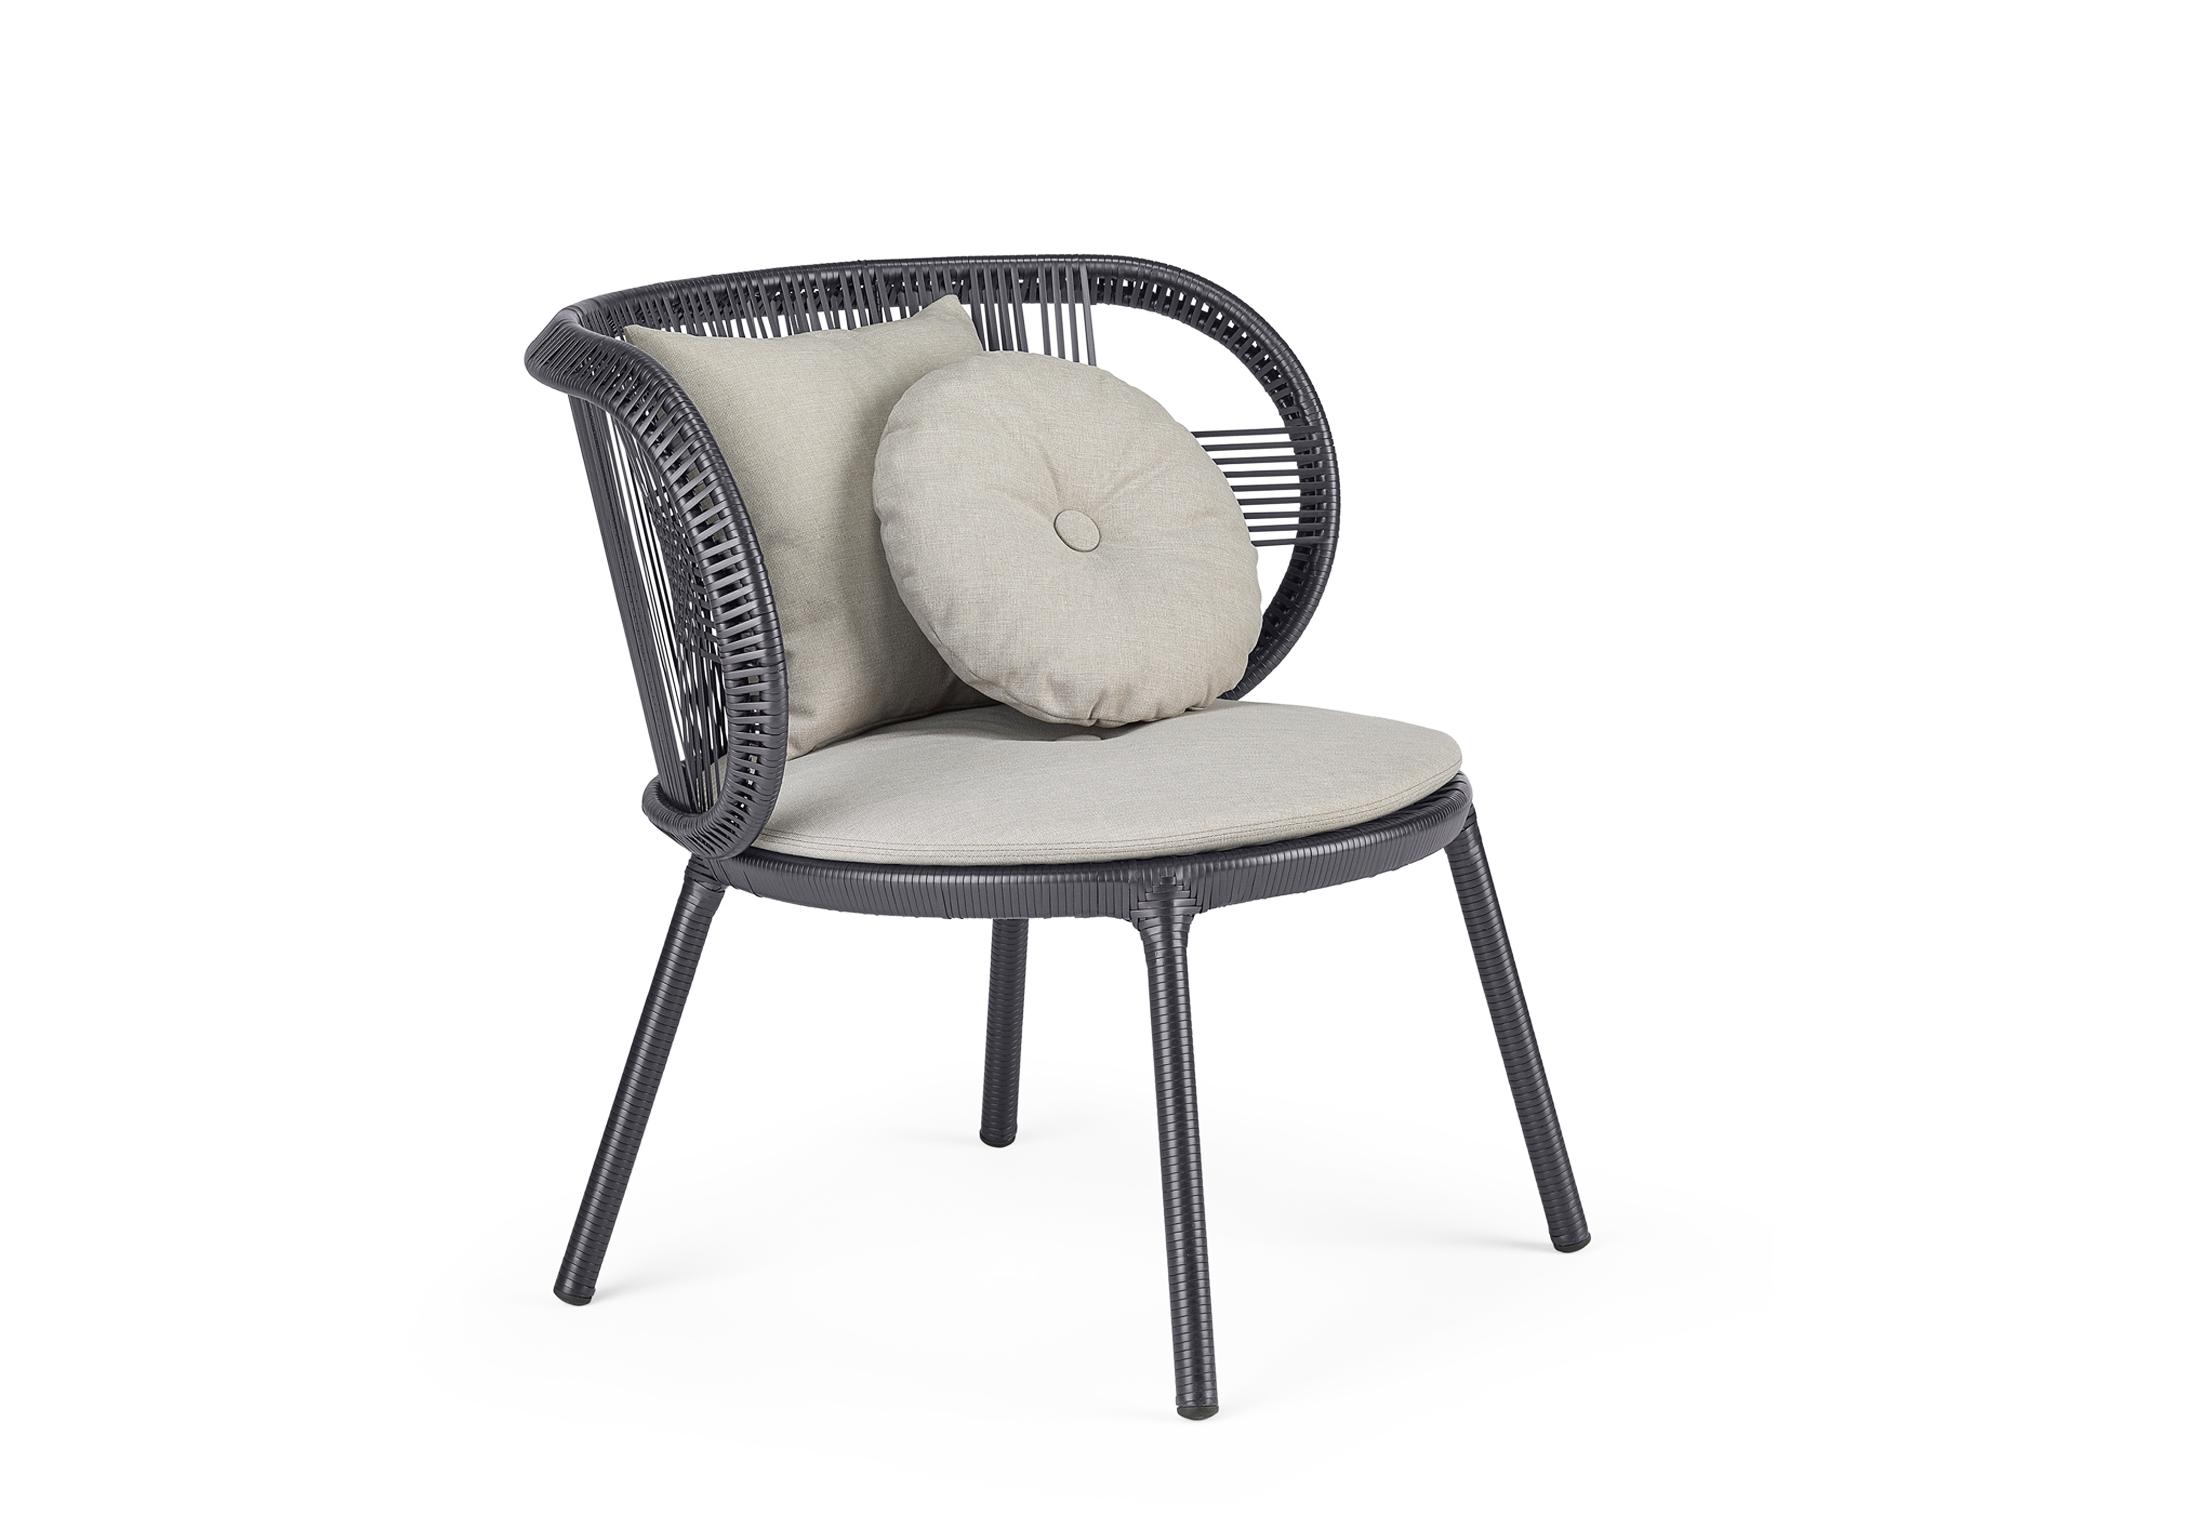 Amazing Cirql Lounge Chair By Dedon Stylepark Machost Co Dining Chair Design Ideas Machostcouk